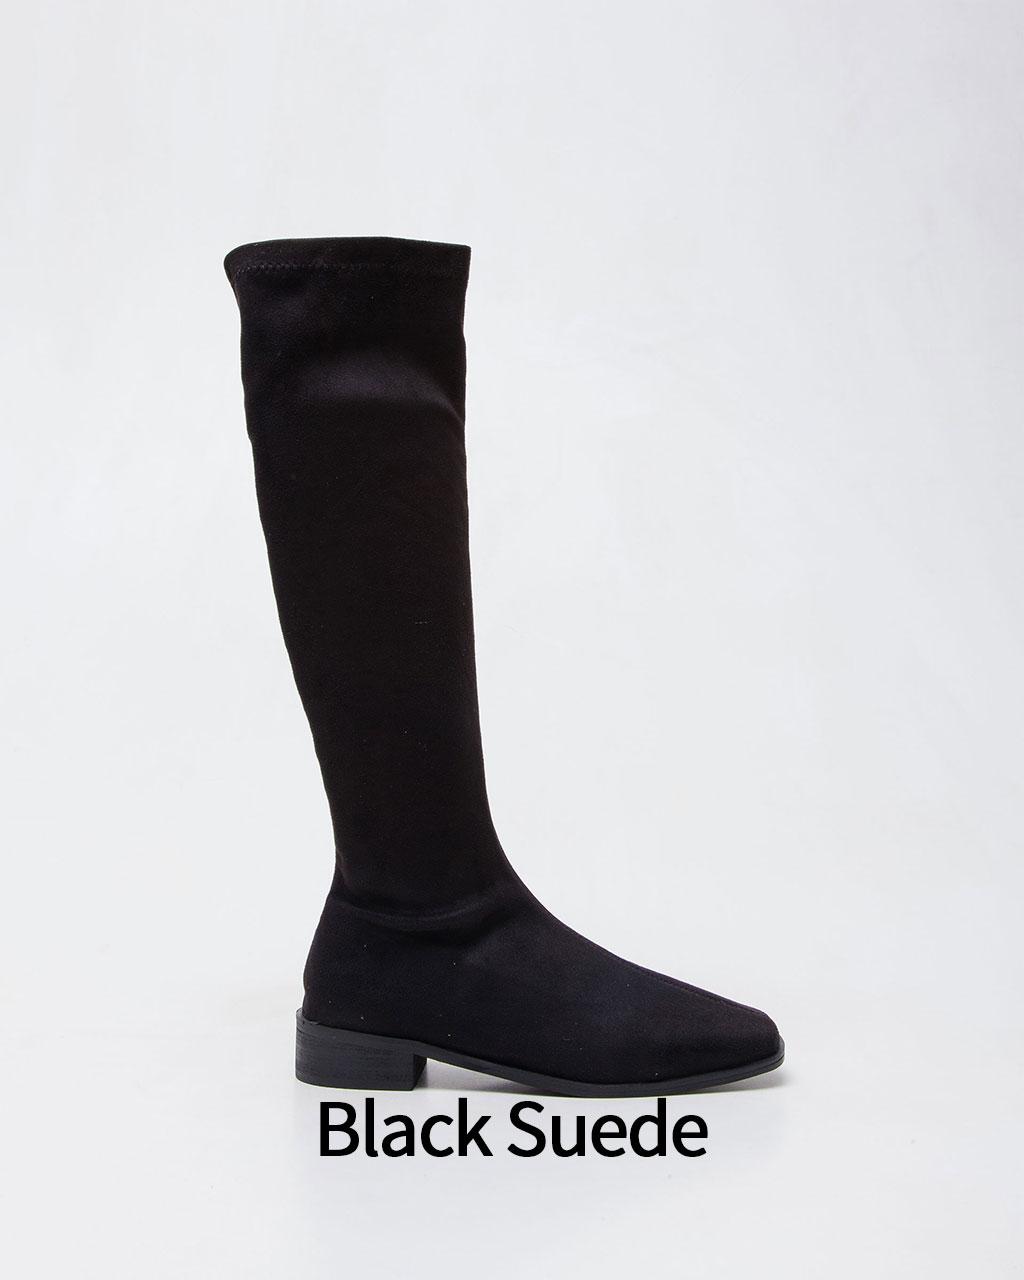 Tagtraume Breather-05 - Black Suede(블랙 스웨이드)